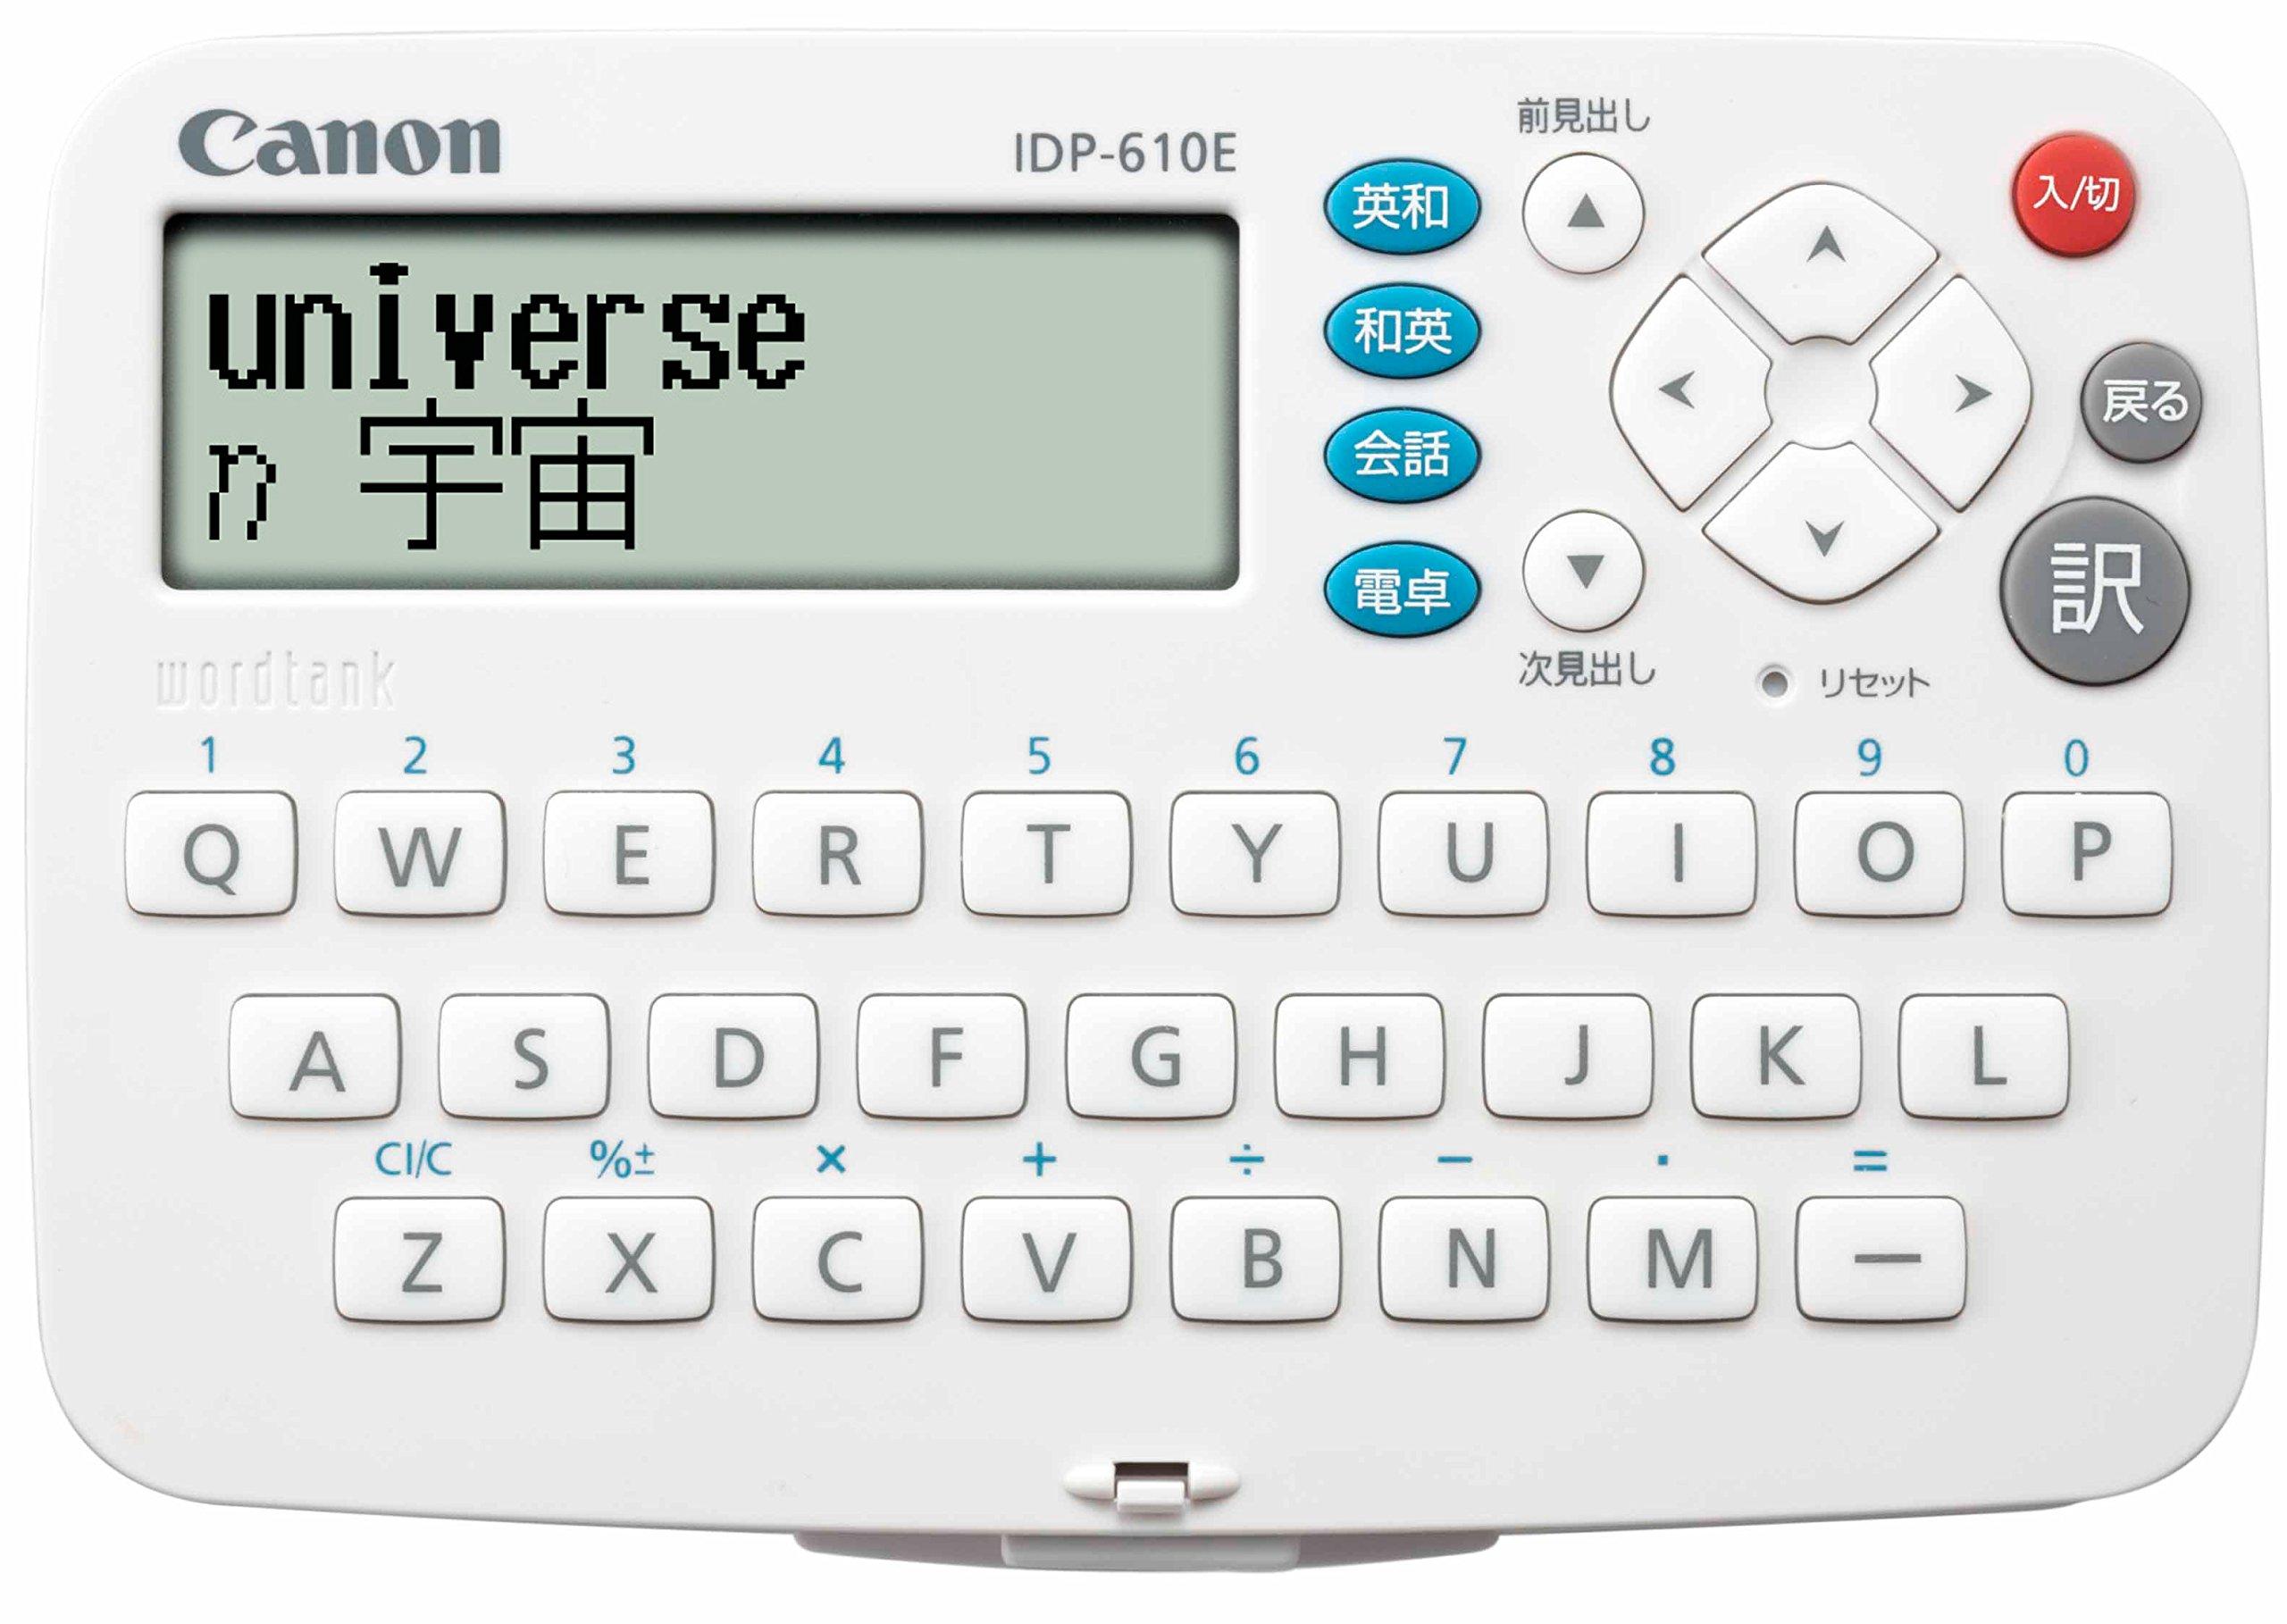 Canon Japanese/English Electronic Dictionary - WordTank IDP-610E